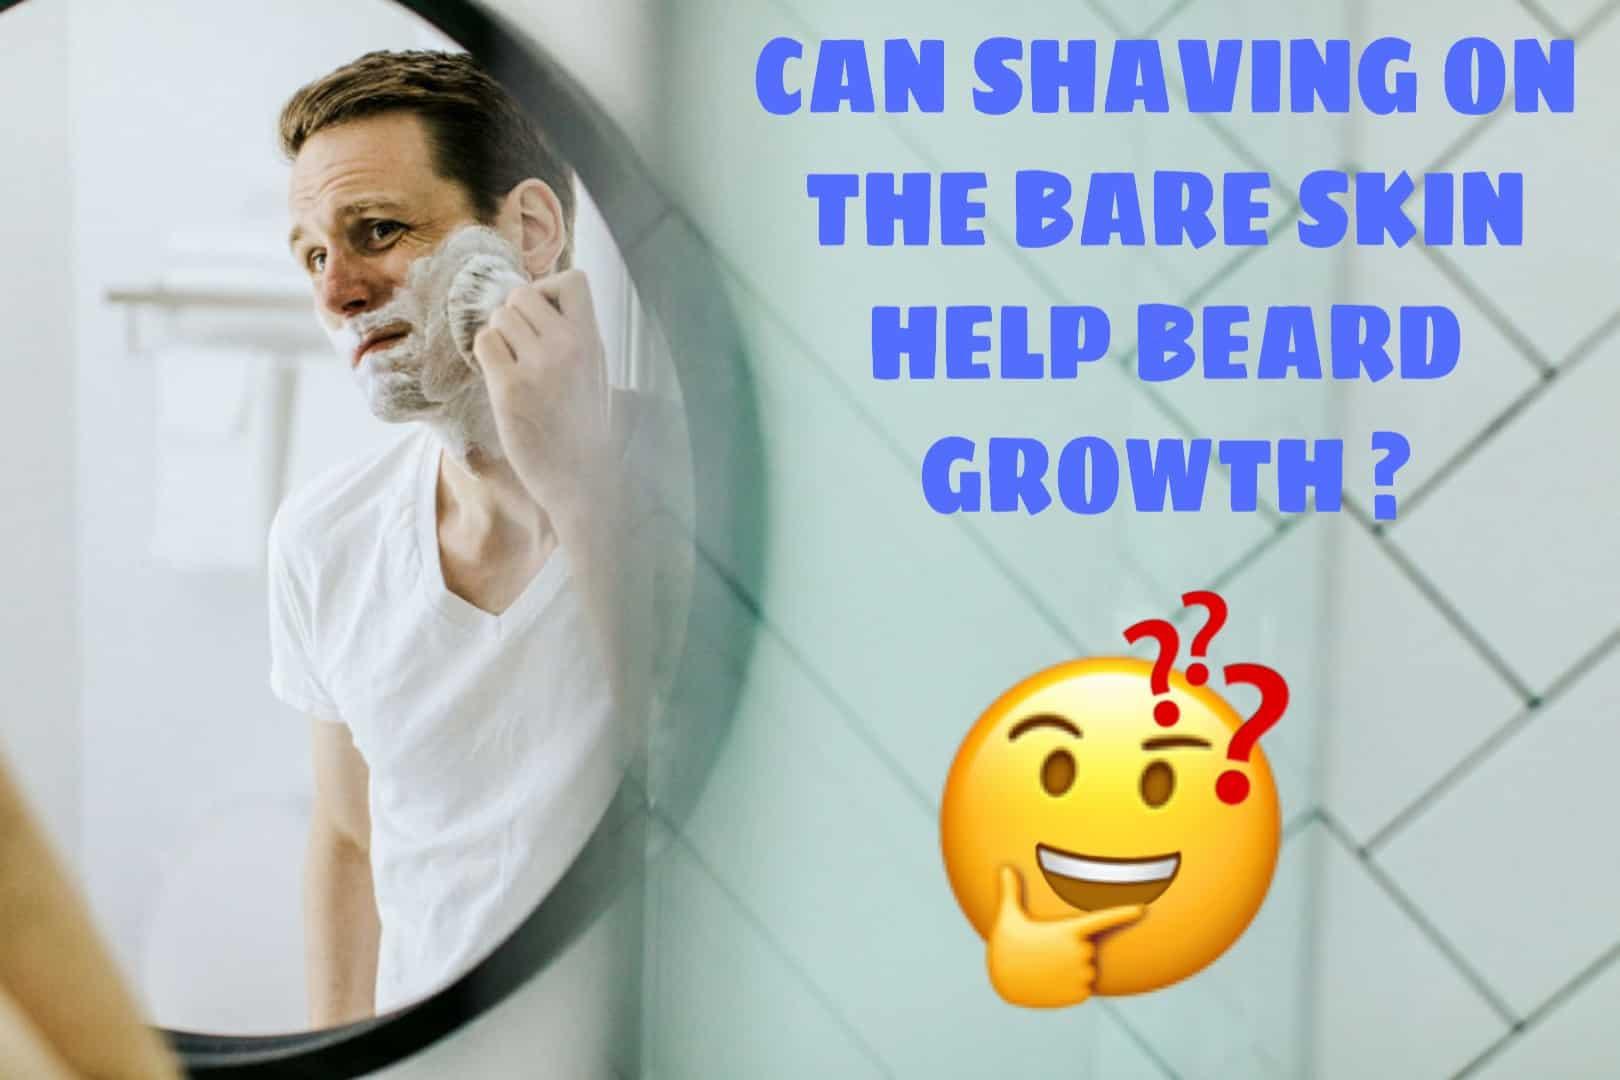 Does Shaving Everyday Help Beard Growth?